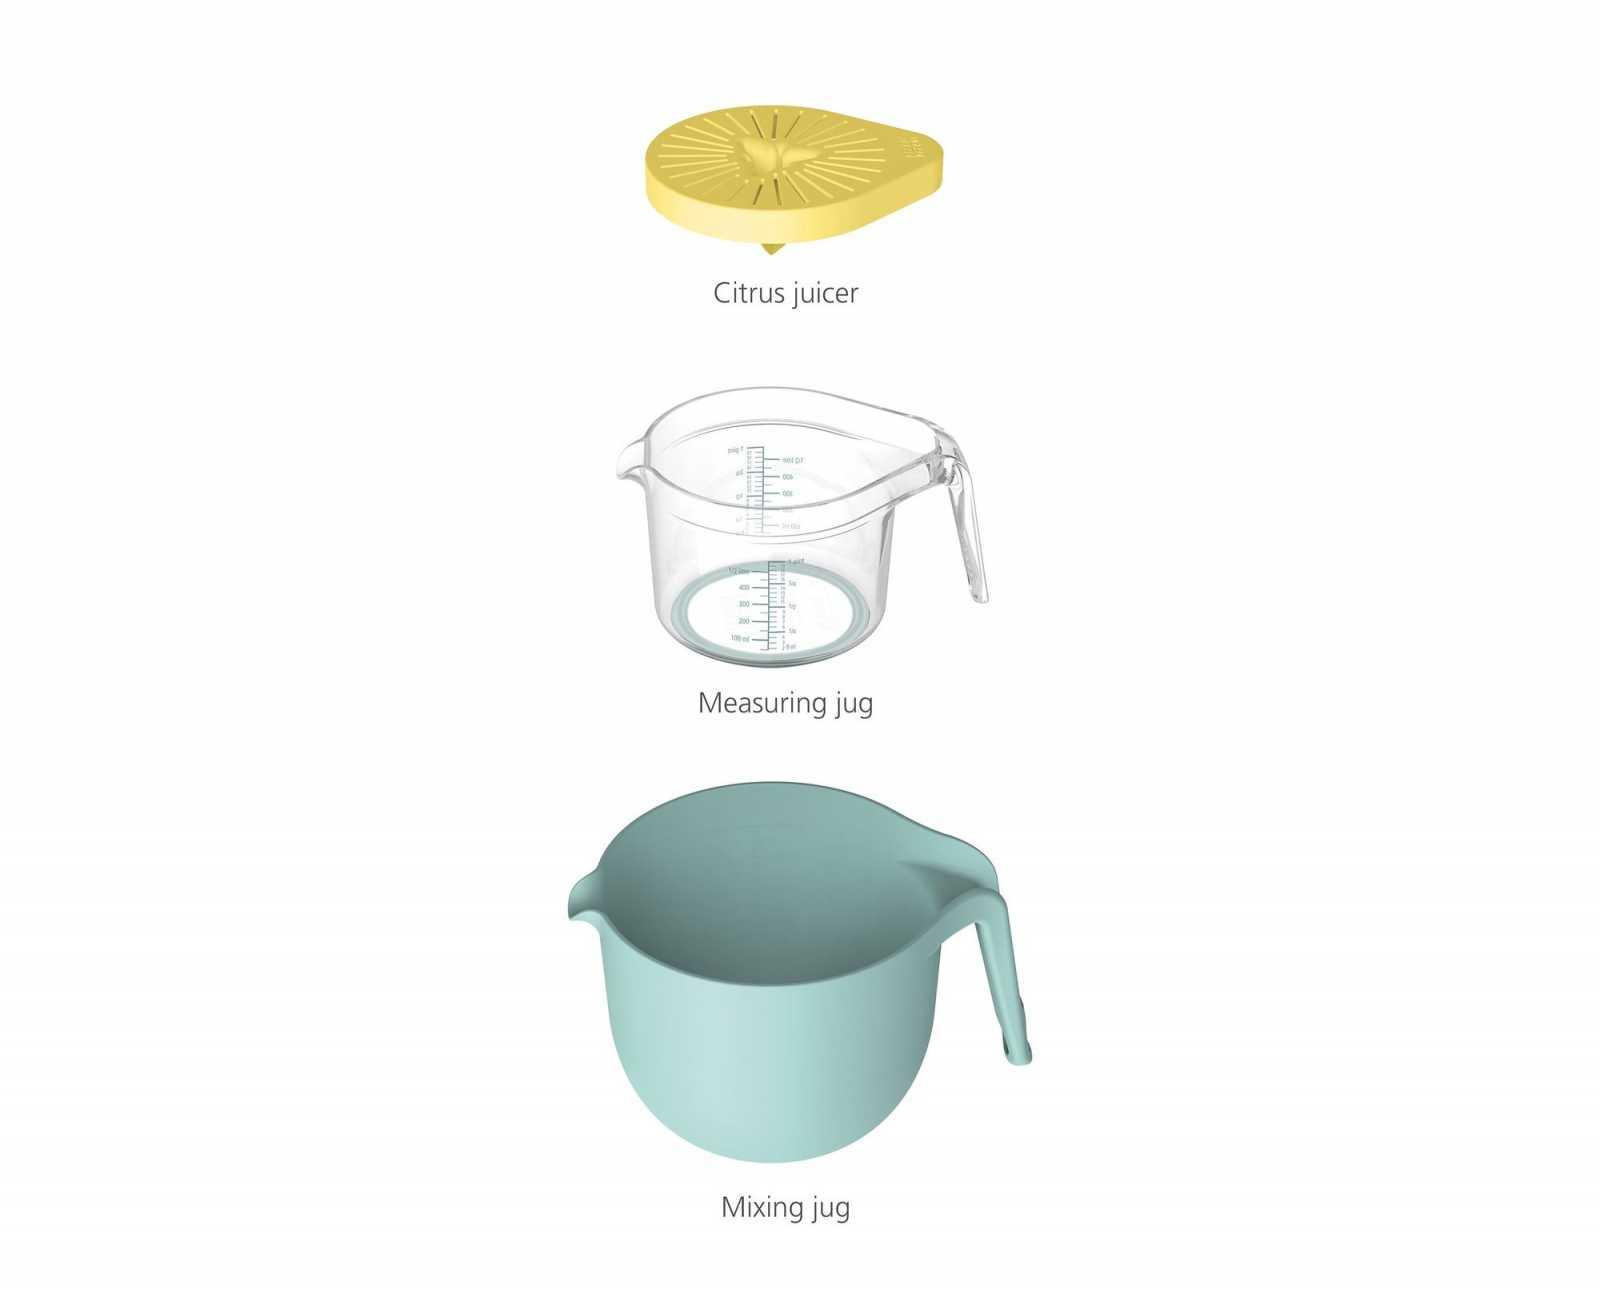 Набор кухонной посуды Joseph Joseph NEST, 3 предмета, желто-голубой Joseph Joseph 40110 фото 1